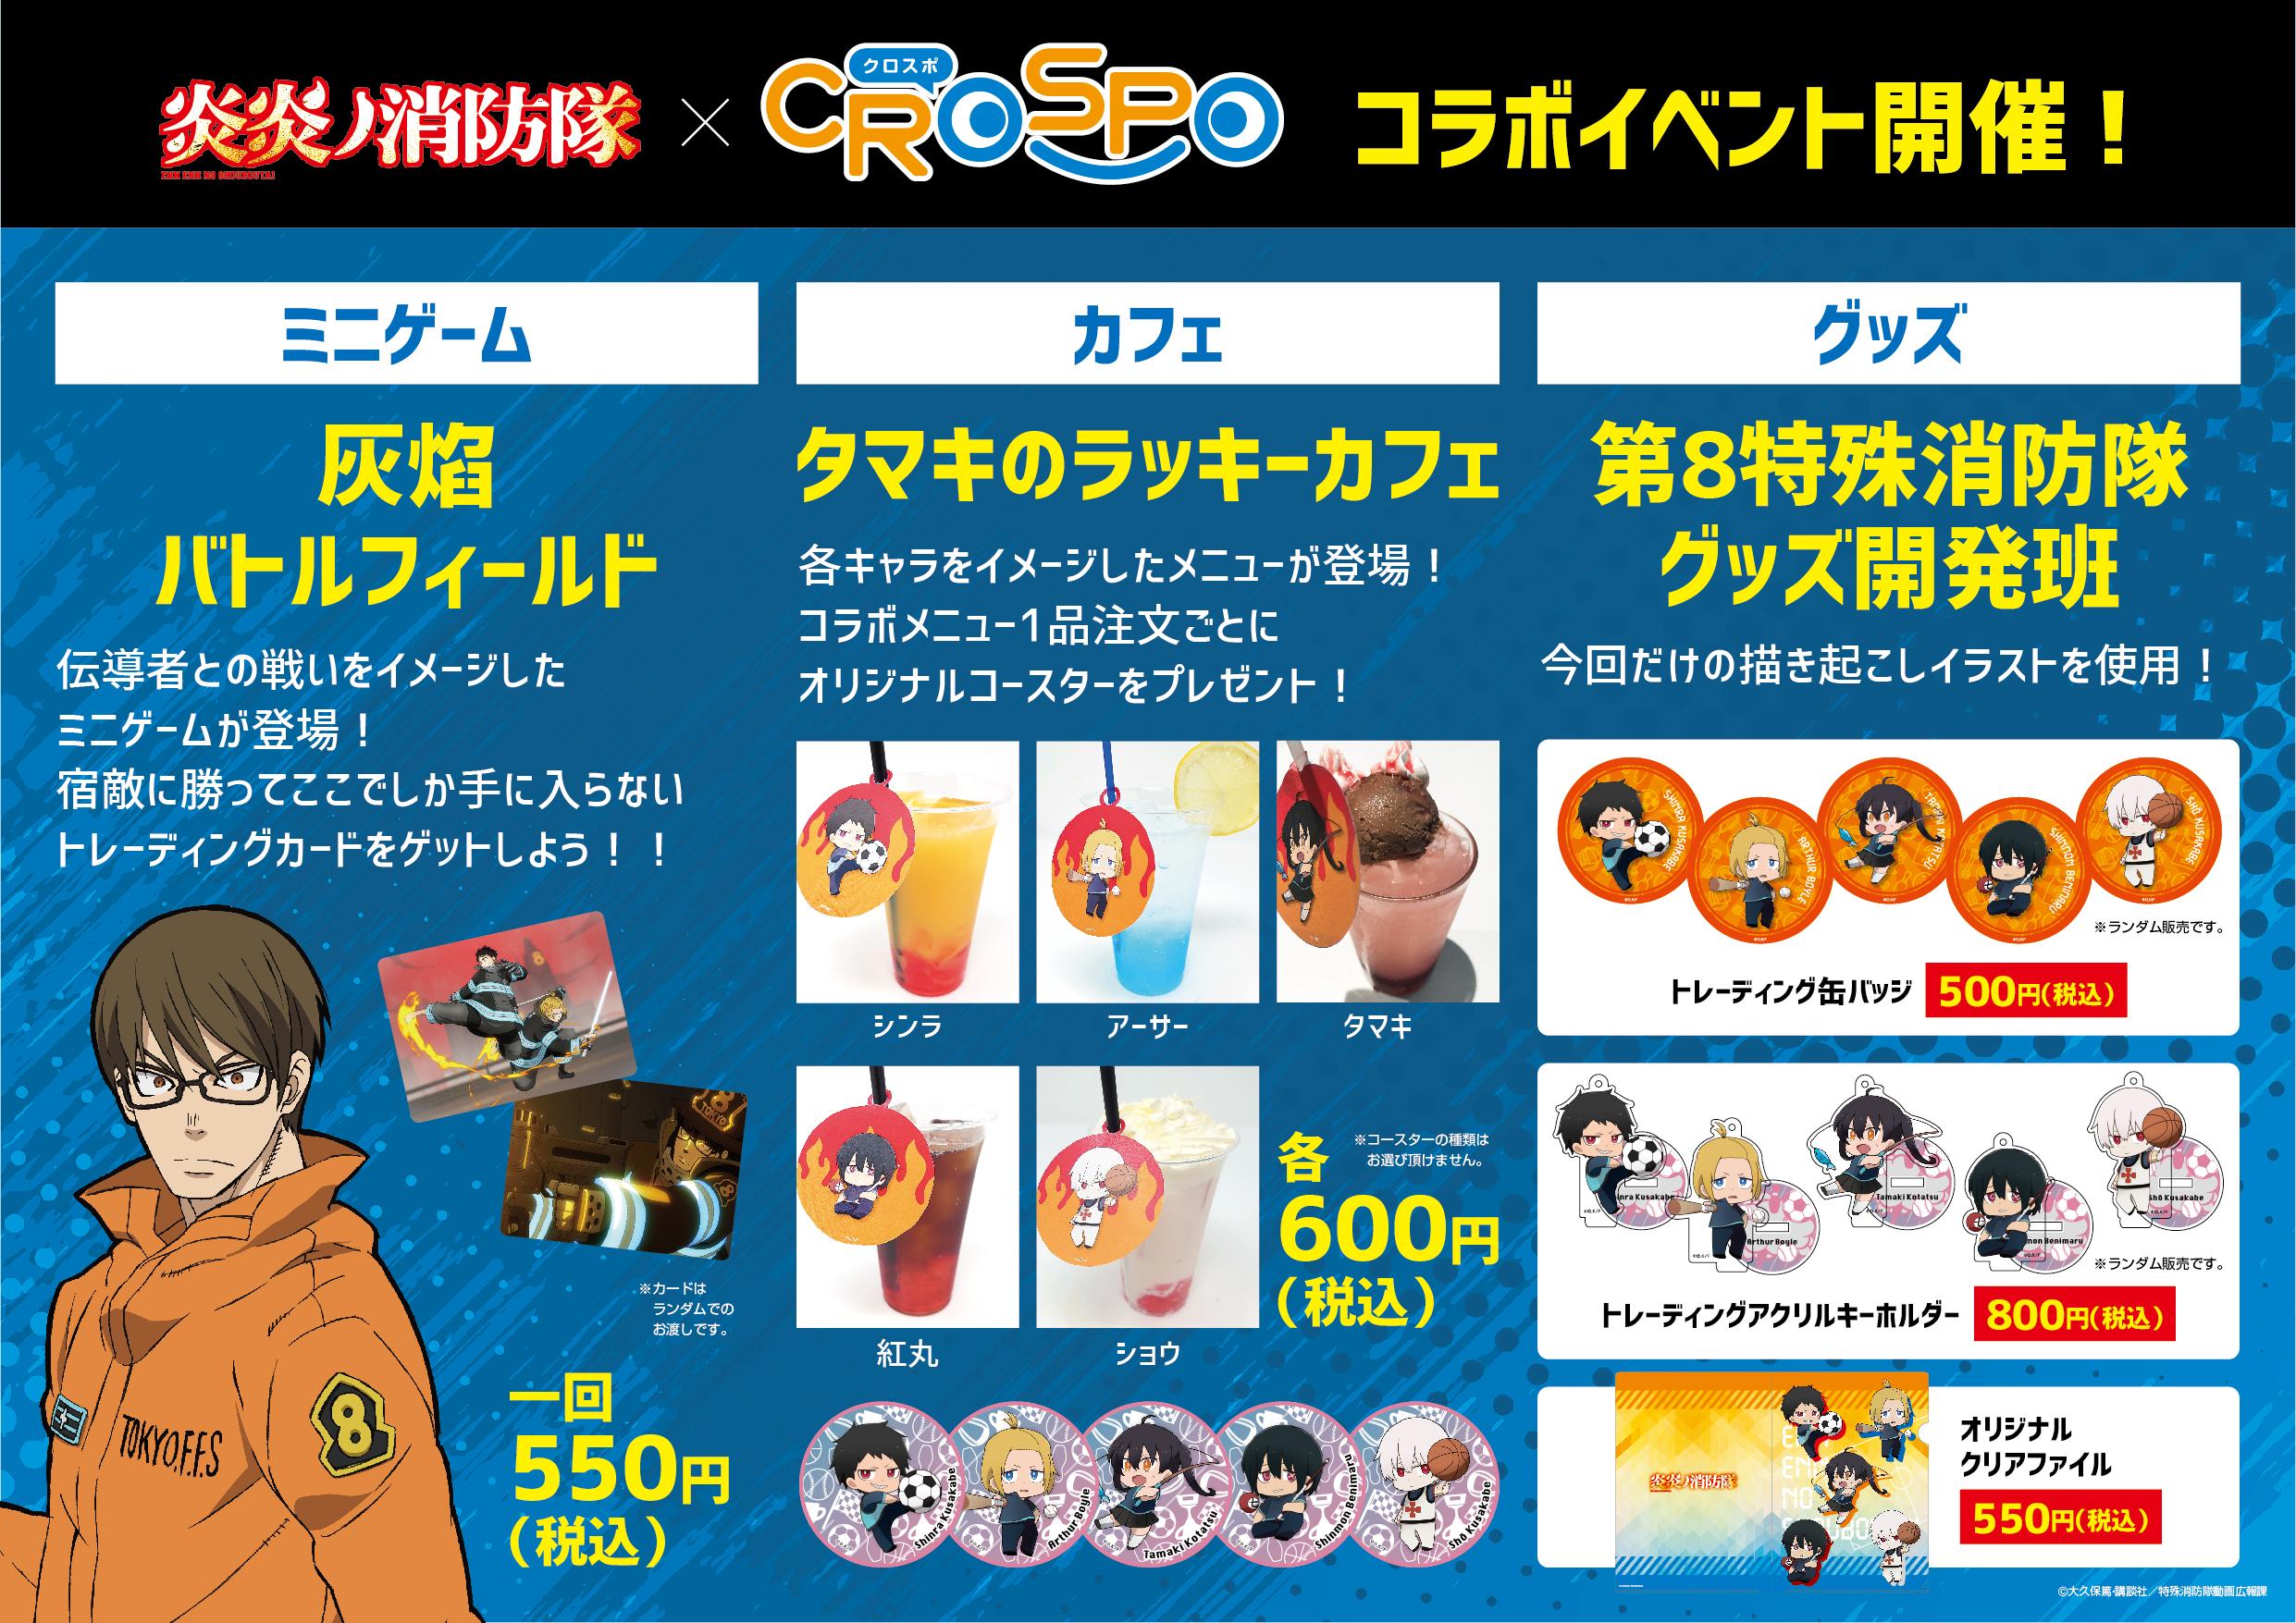 TVアニメ「炎炎ノ消防隊」コラボイベントクロスポ千葉浜野店